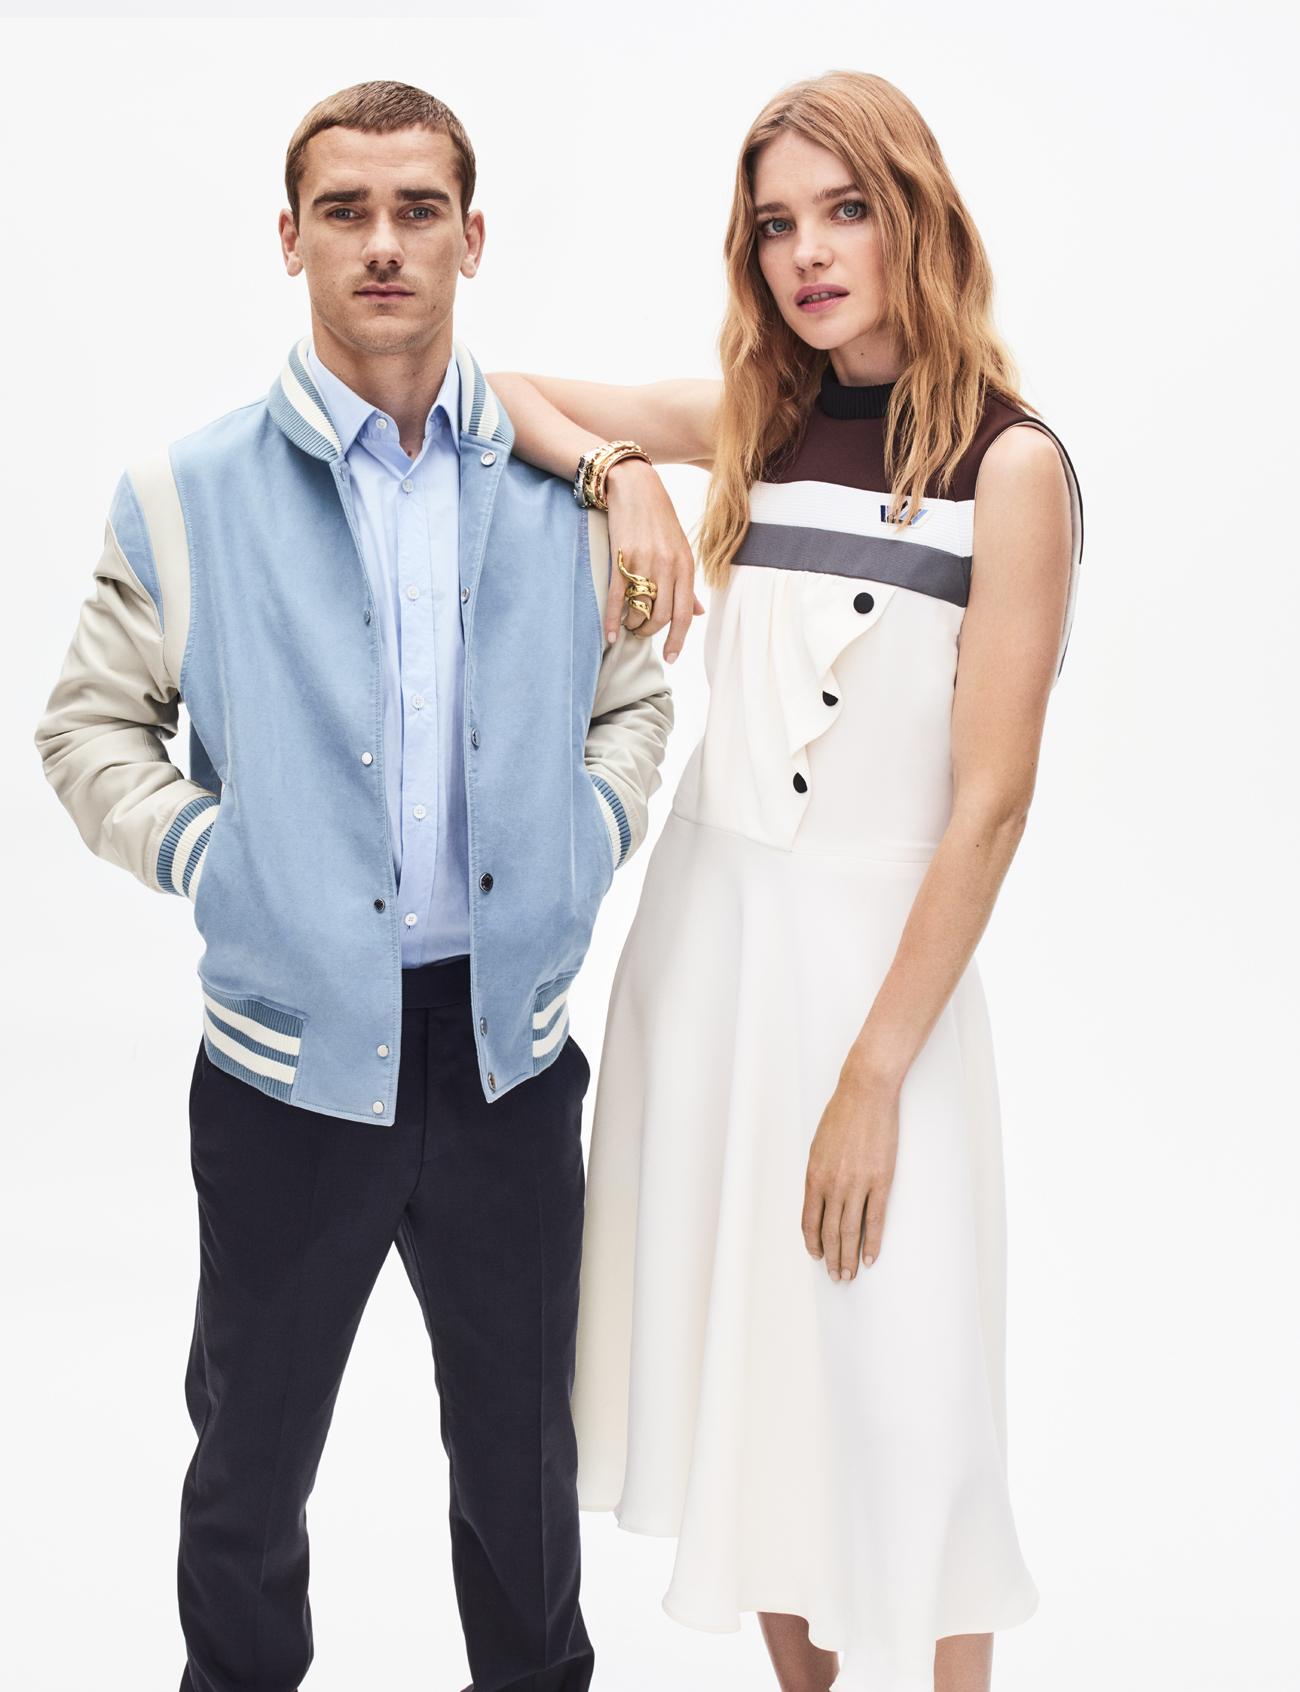 Antoine Griezmann & Natalia Vodianova